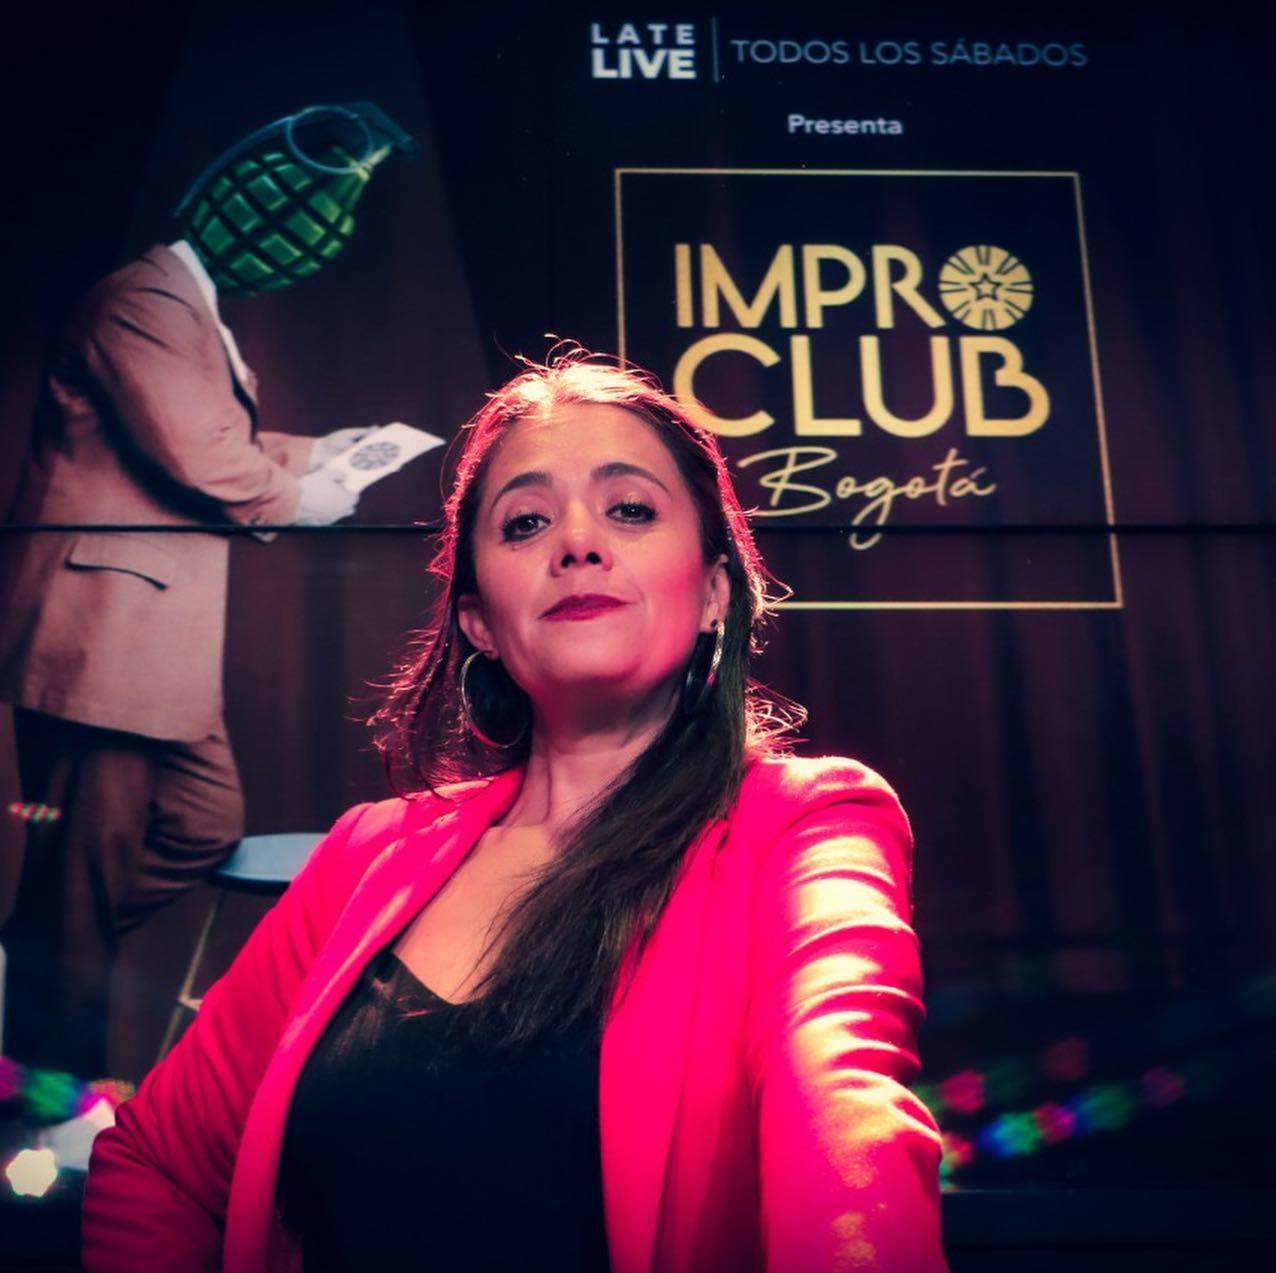 impro club bogota late live